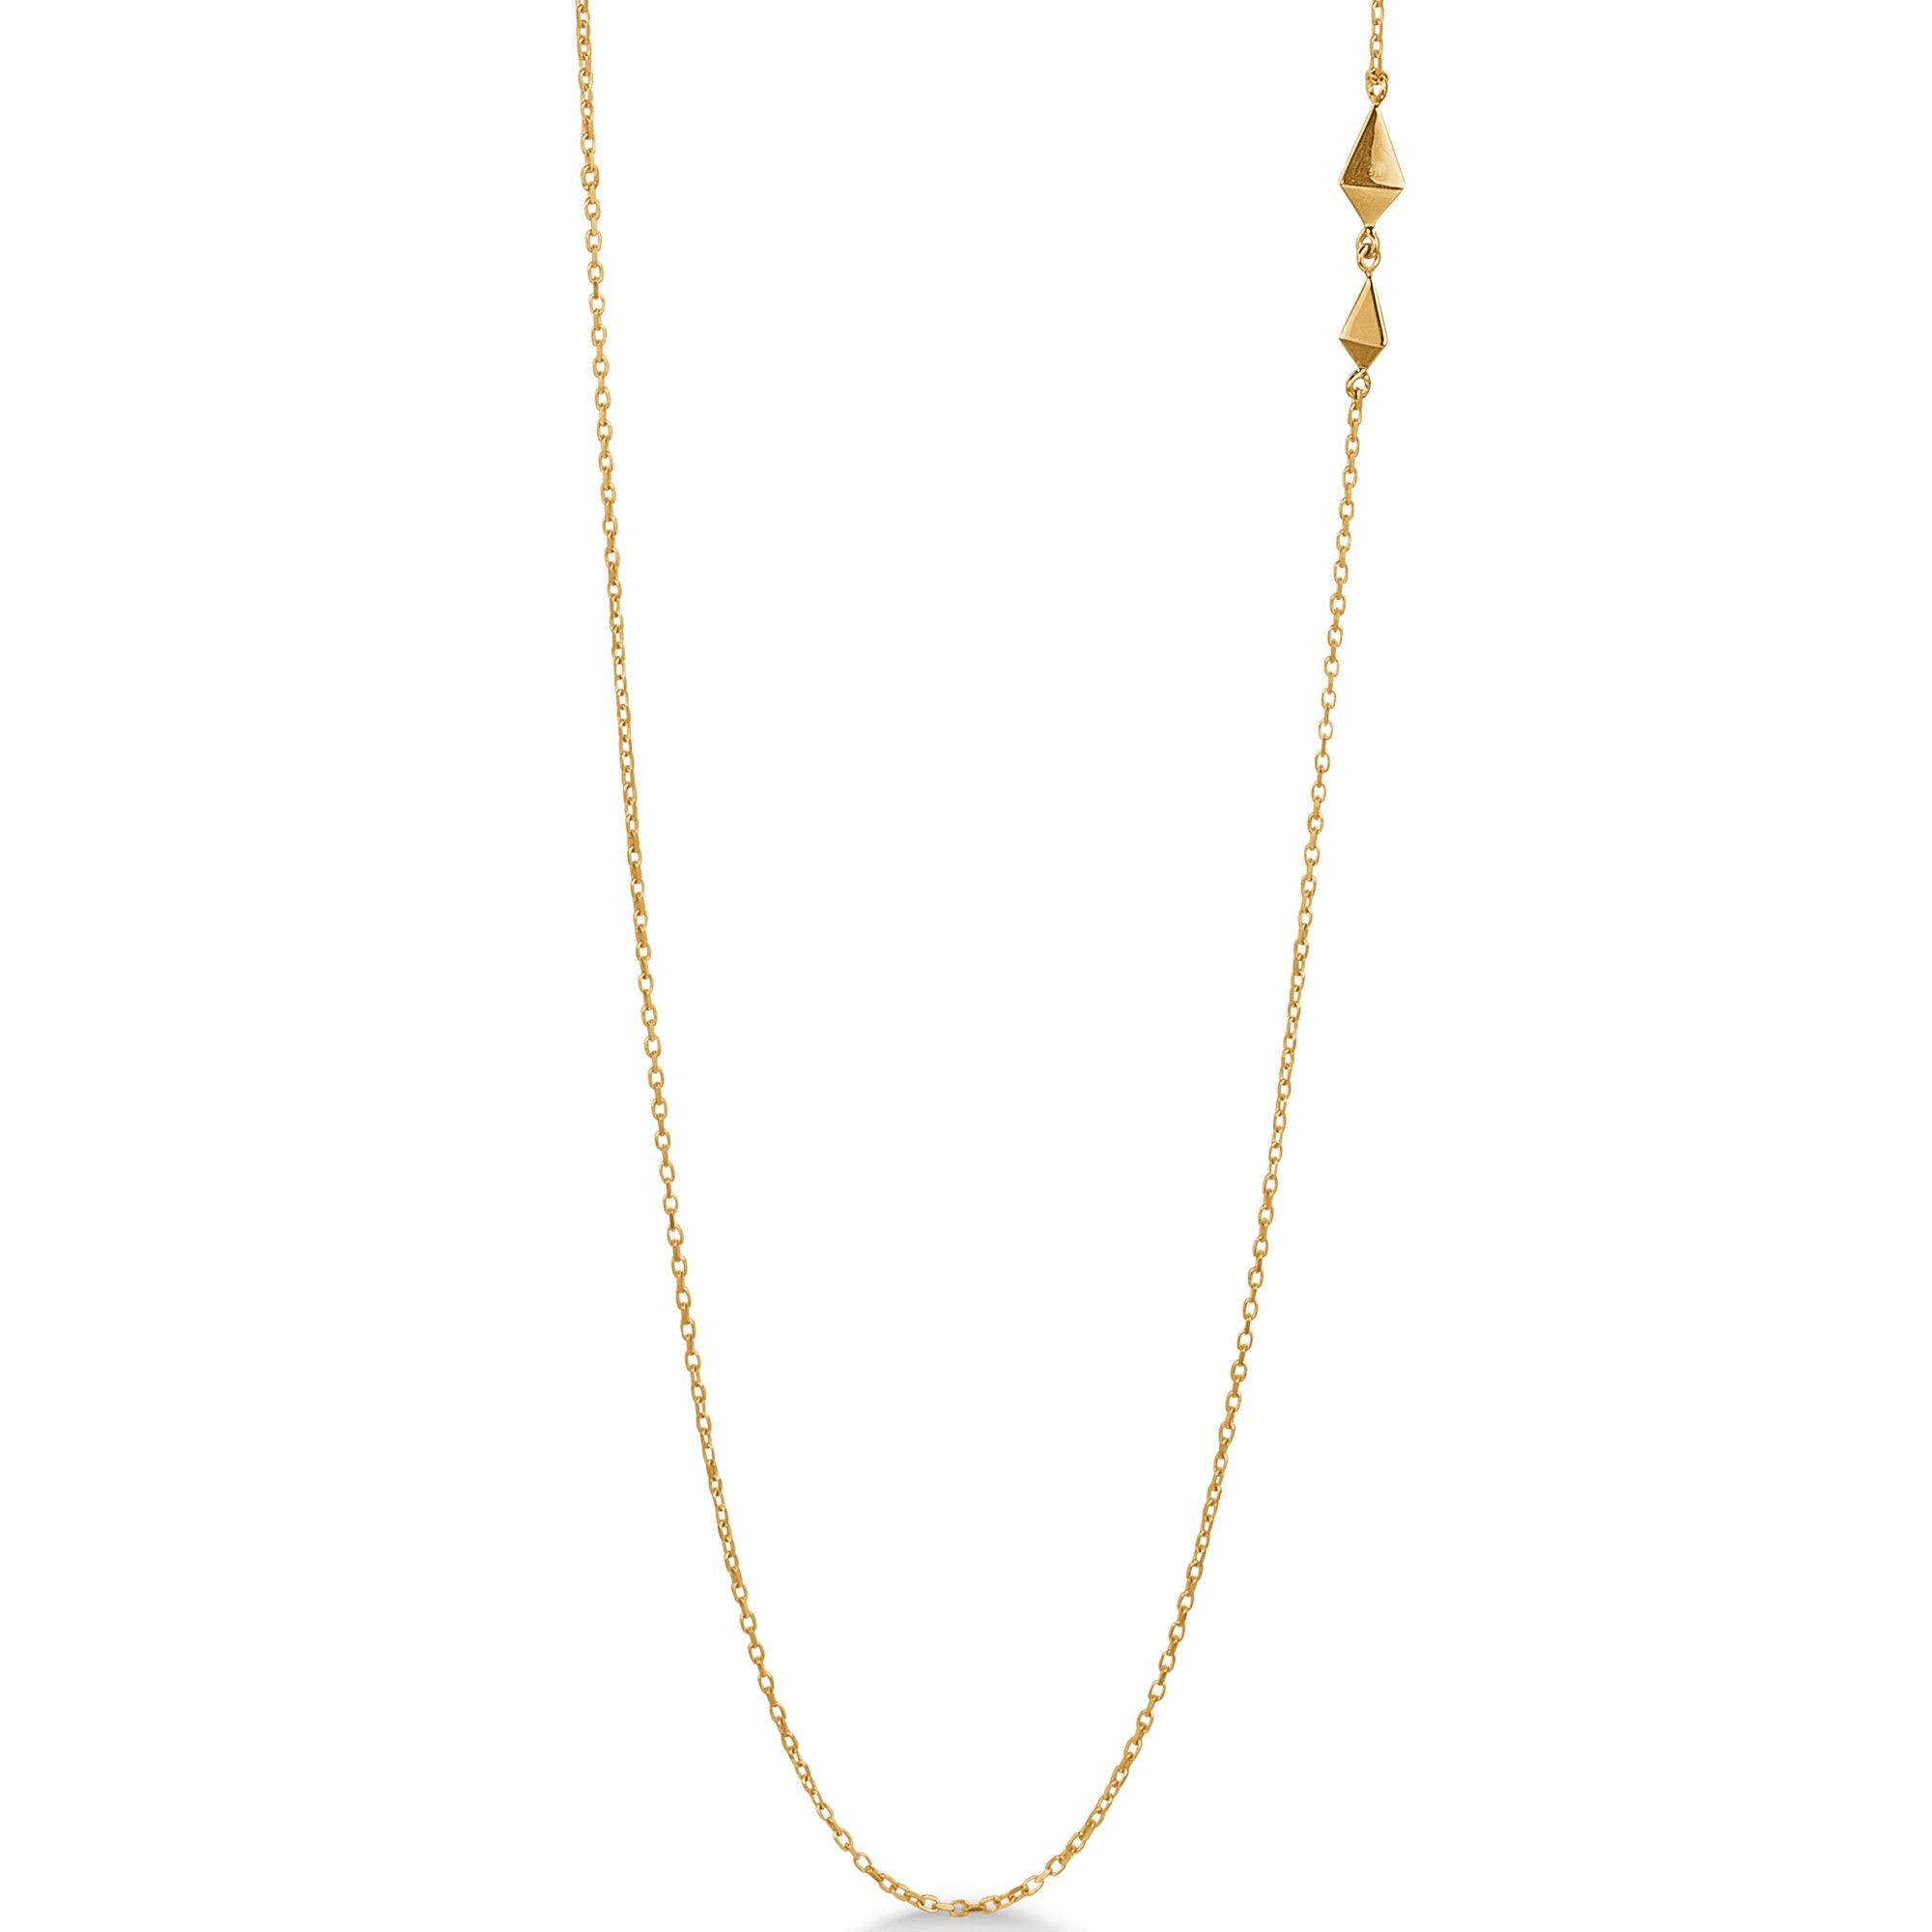 cb969ae3150 PRISM halskæde i 14 karat guld. Enkel, lang halskæde med fin detalje i det